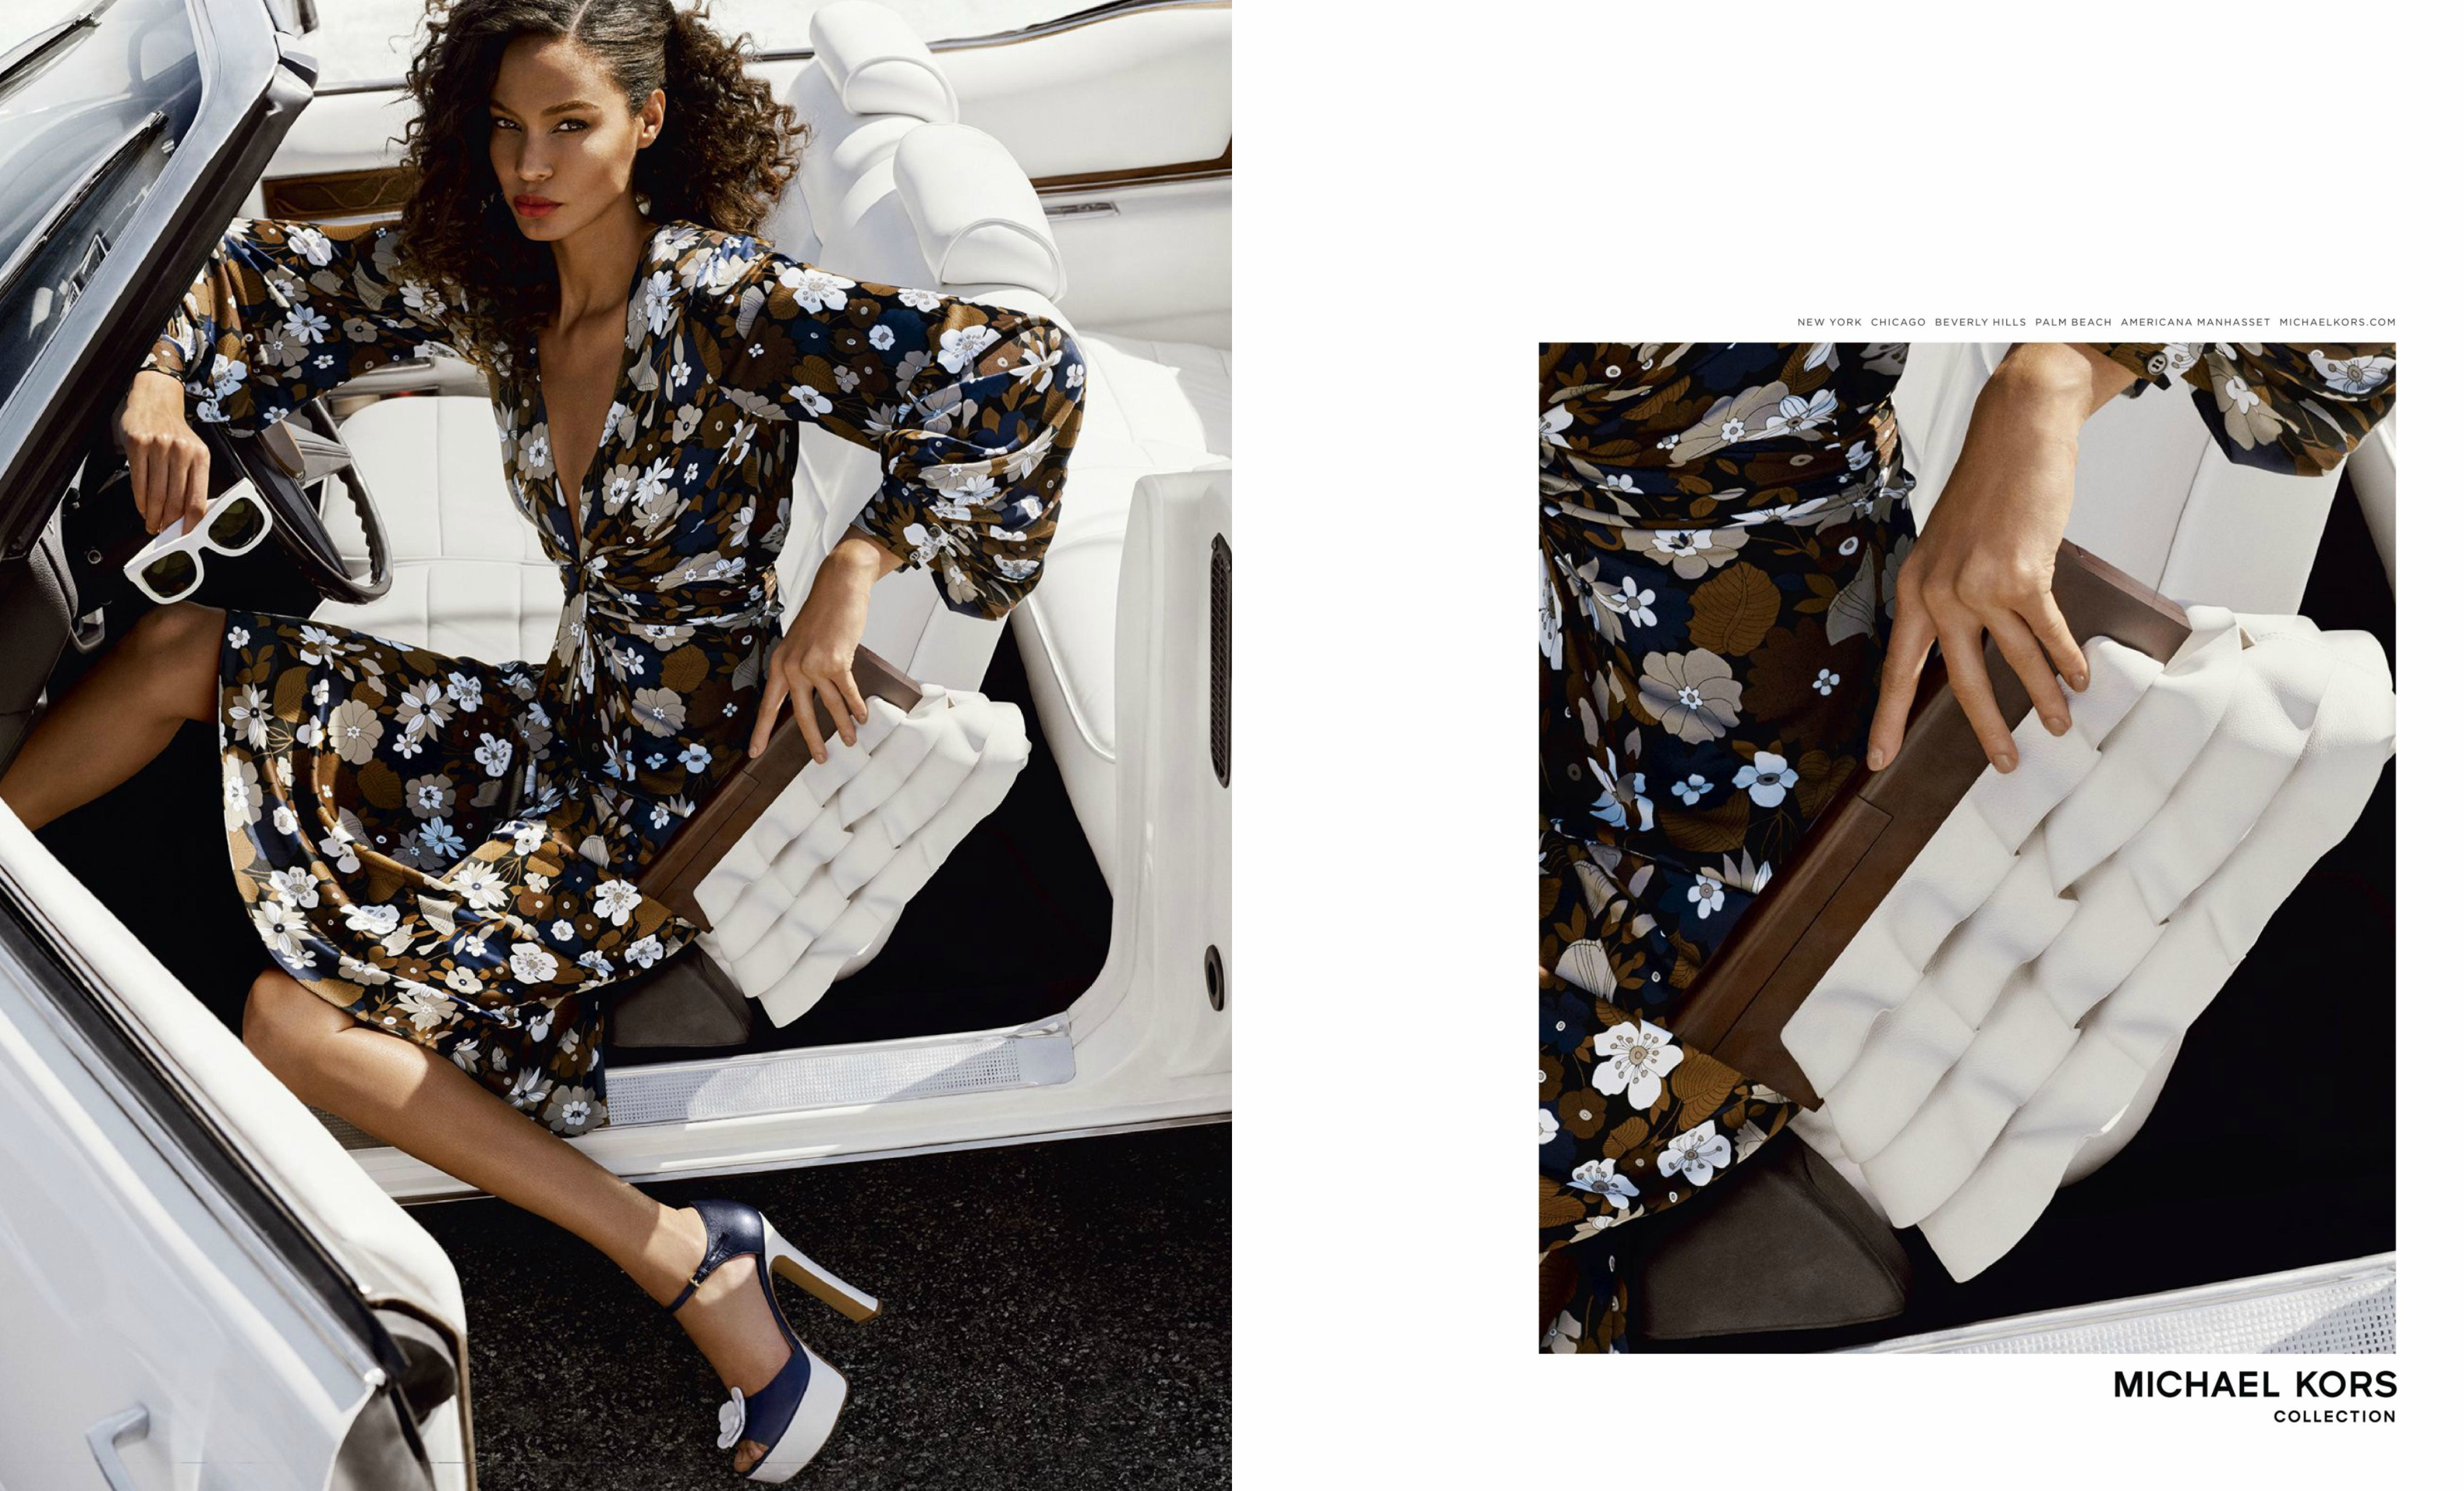 michael kors 39 spring 2017 ad campaigns. Black Bedroom Furniture Sets. Home Design Ideas